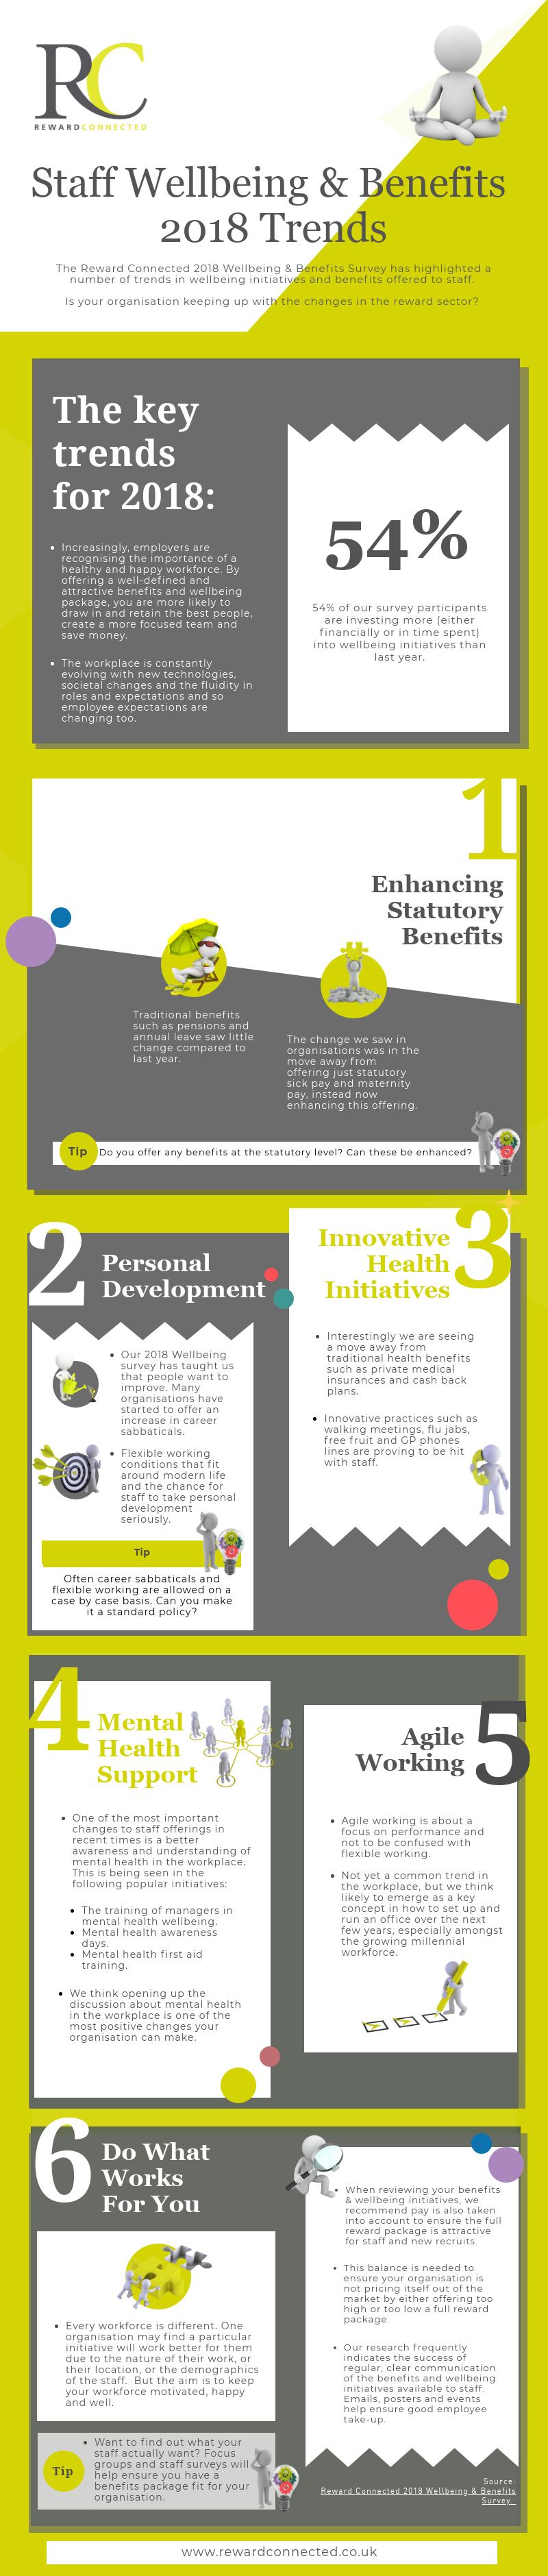 Staff Wellbeing & Benefits - 2018 Trends